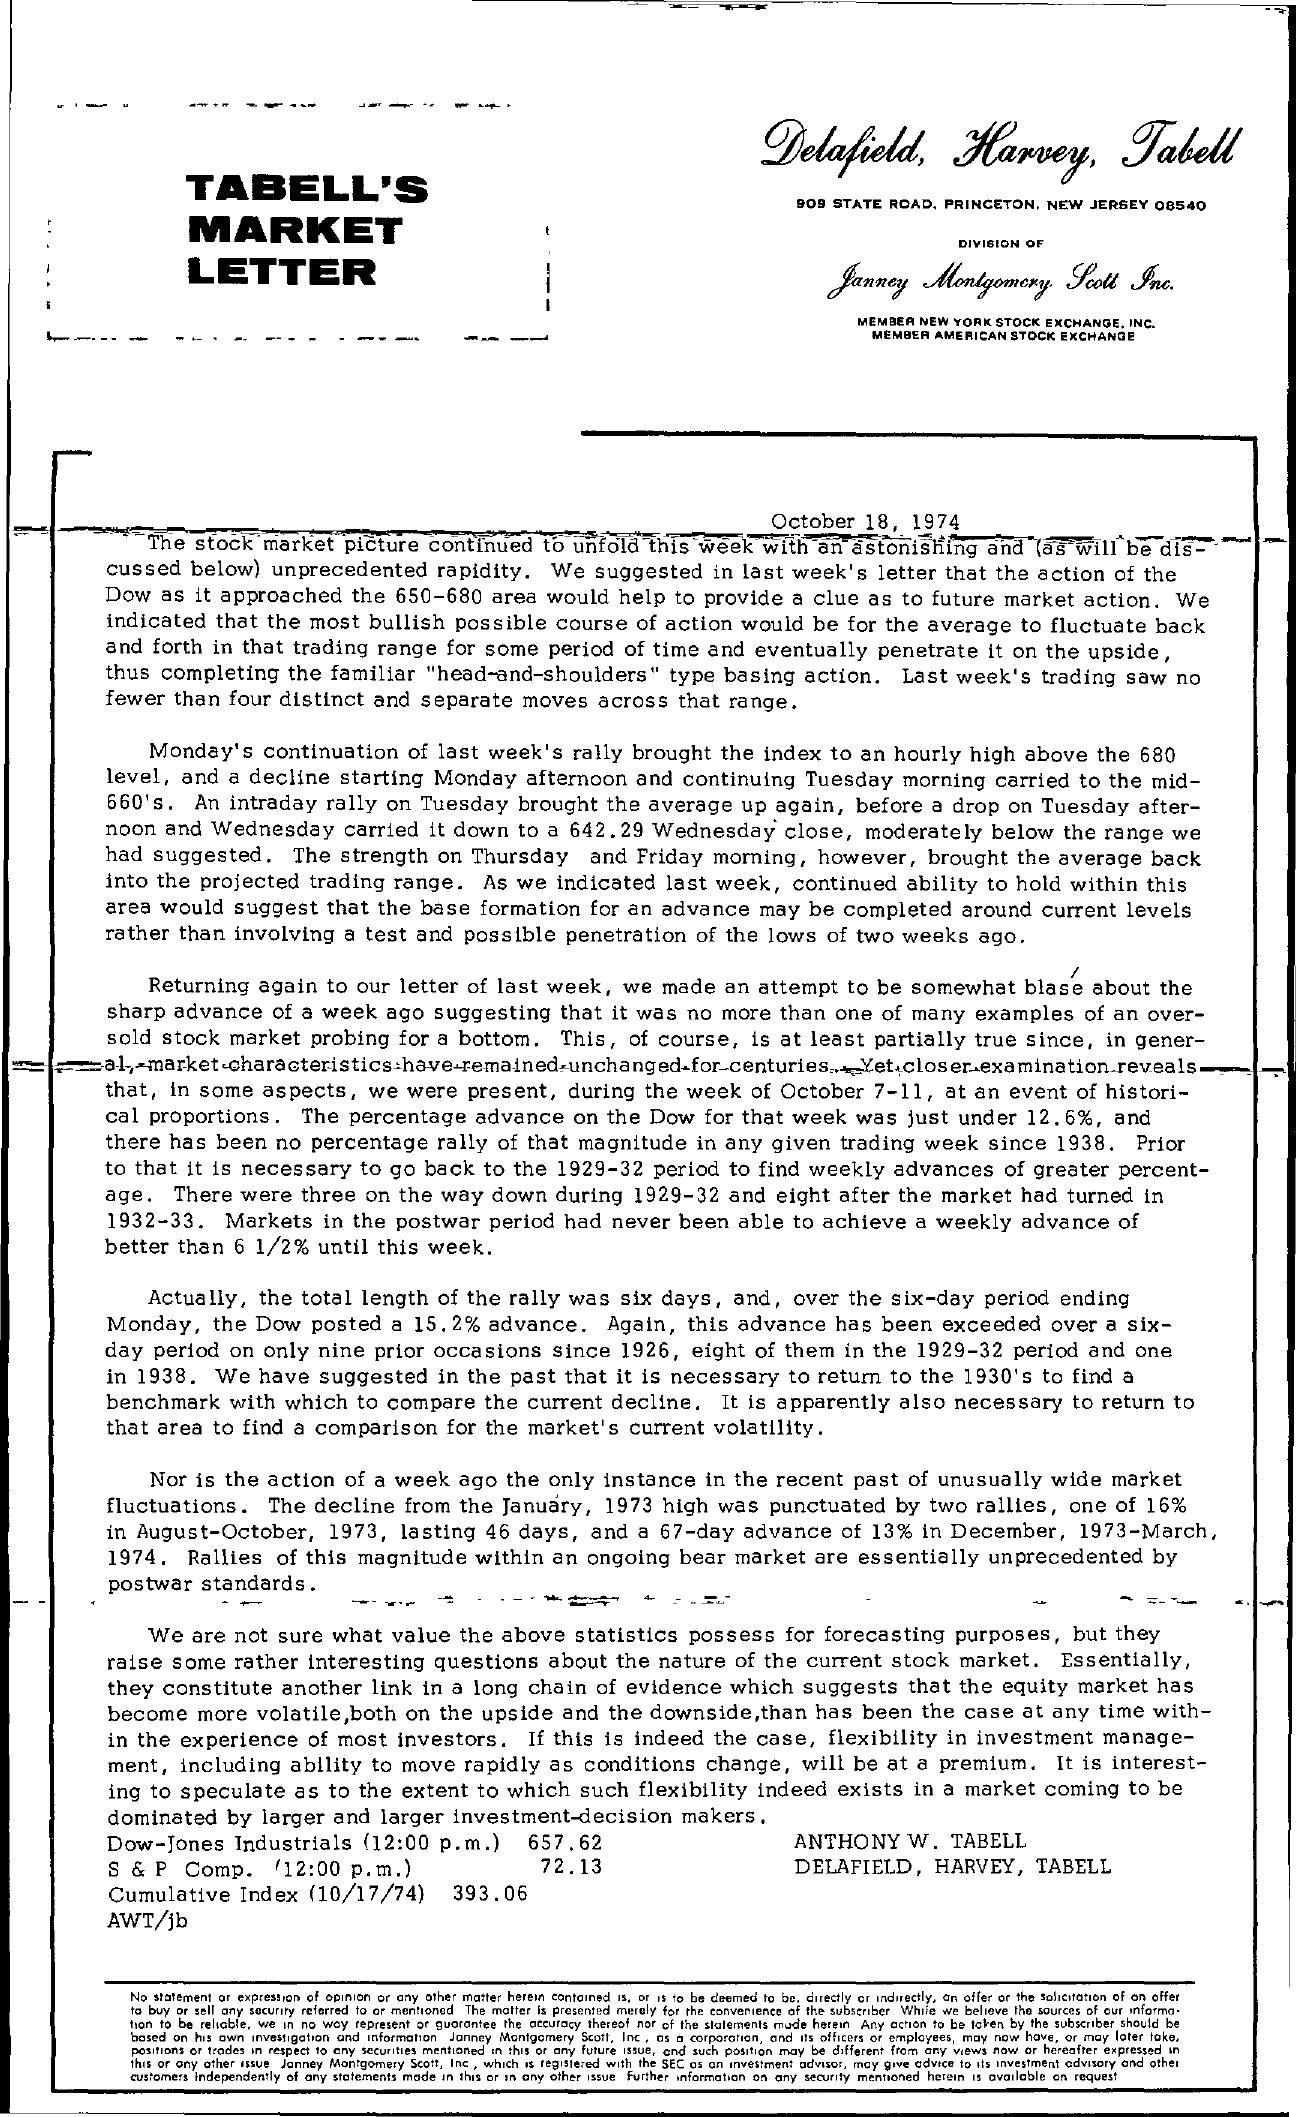 Tabell's Market Letter - October 18, 1974